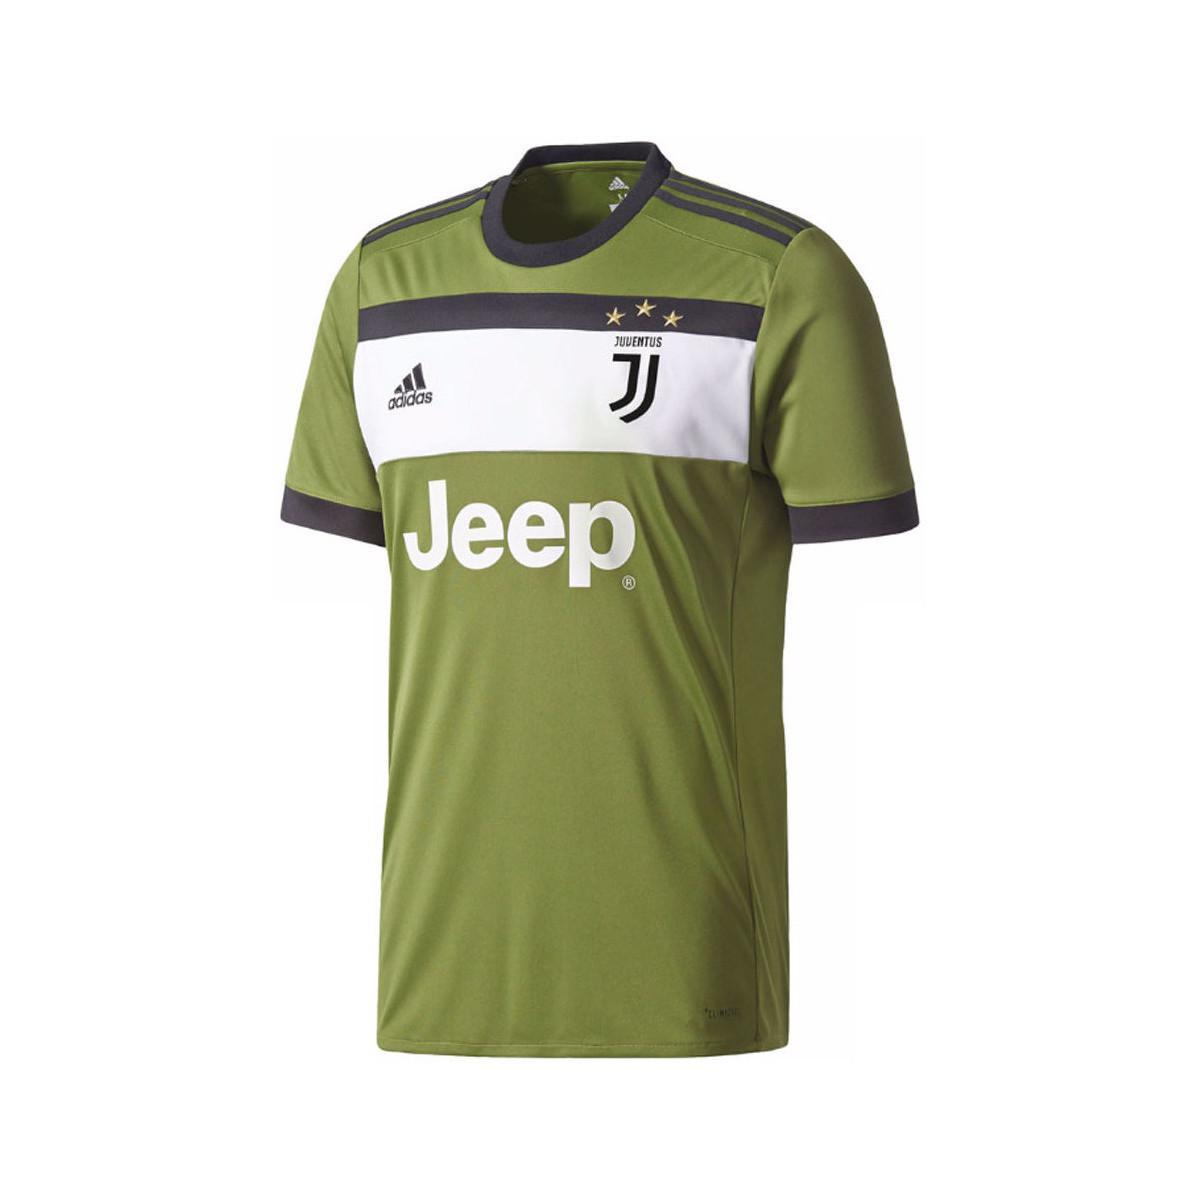 e4e0a2a9976 Adidas 2017-18 Juventus Third Shirt (pirlo 21) - Kids Women s T ...